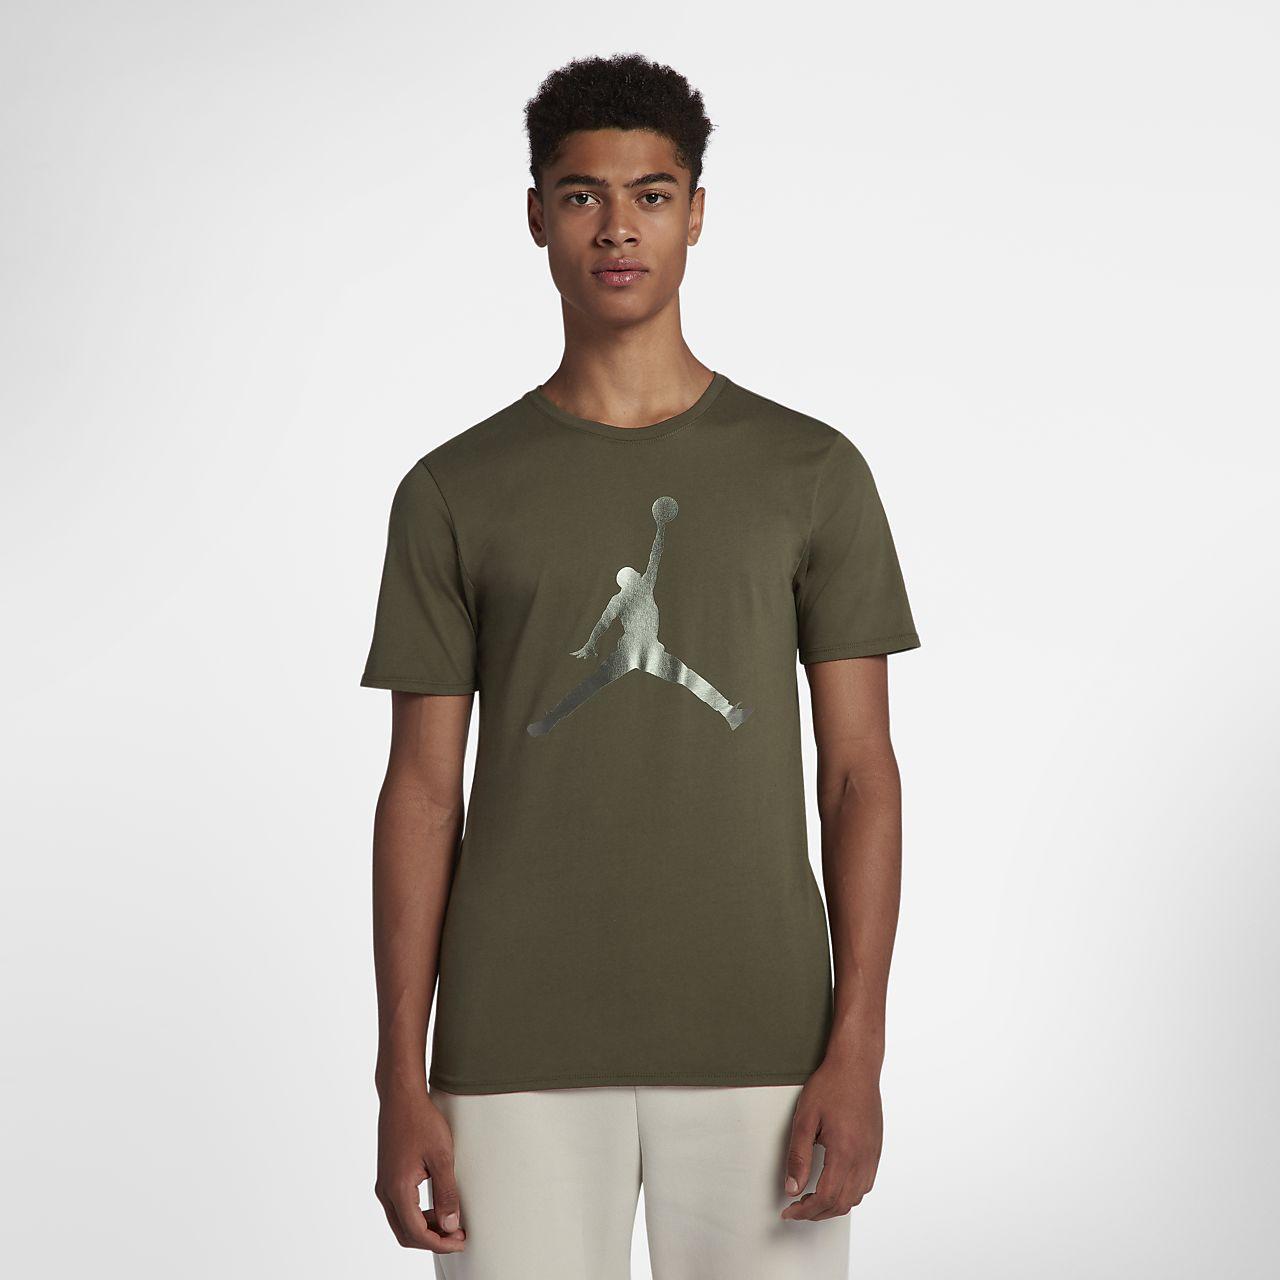 a7bc24ccd3 Jordan Sportswear Iconic Jumpman Camiseta - Hombre. Nike.com ES